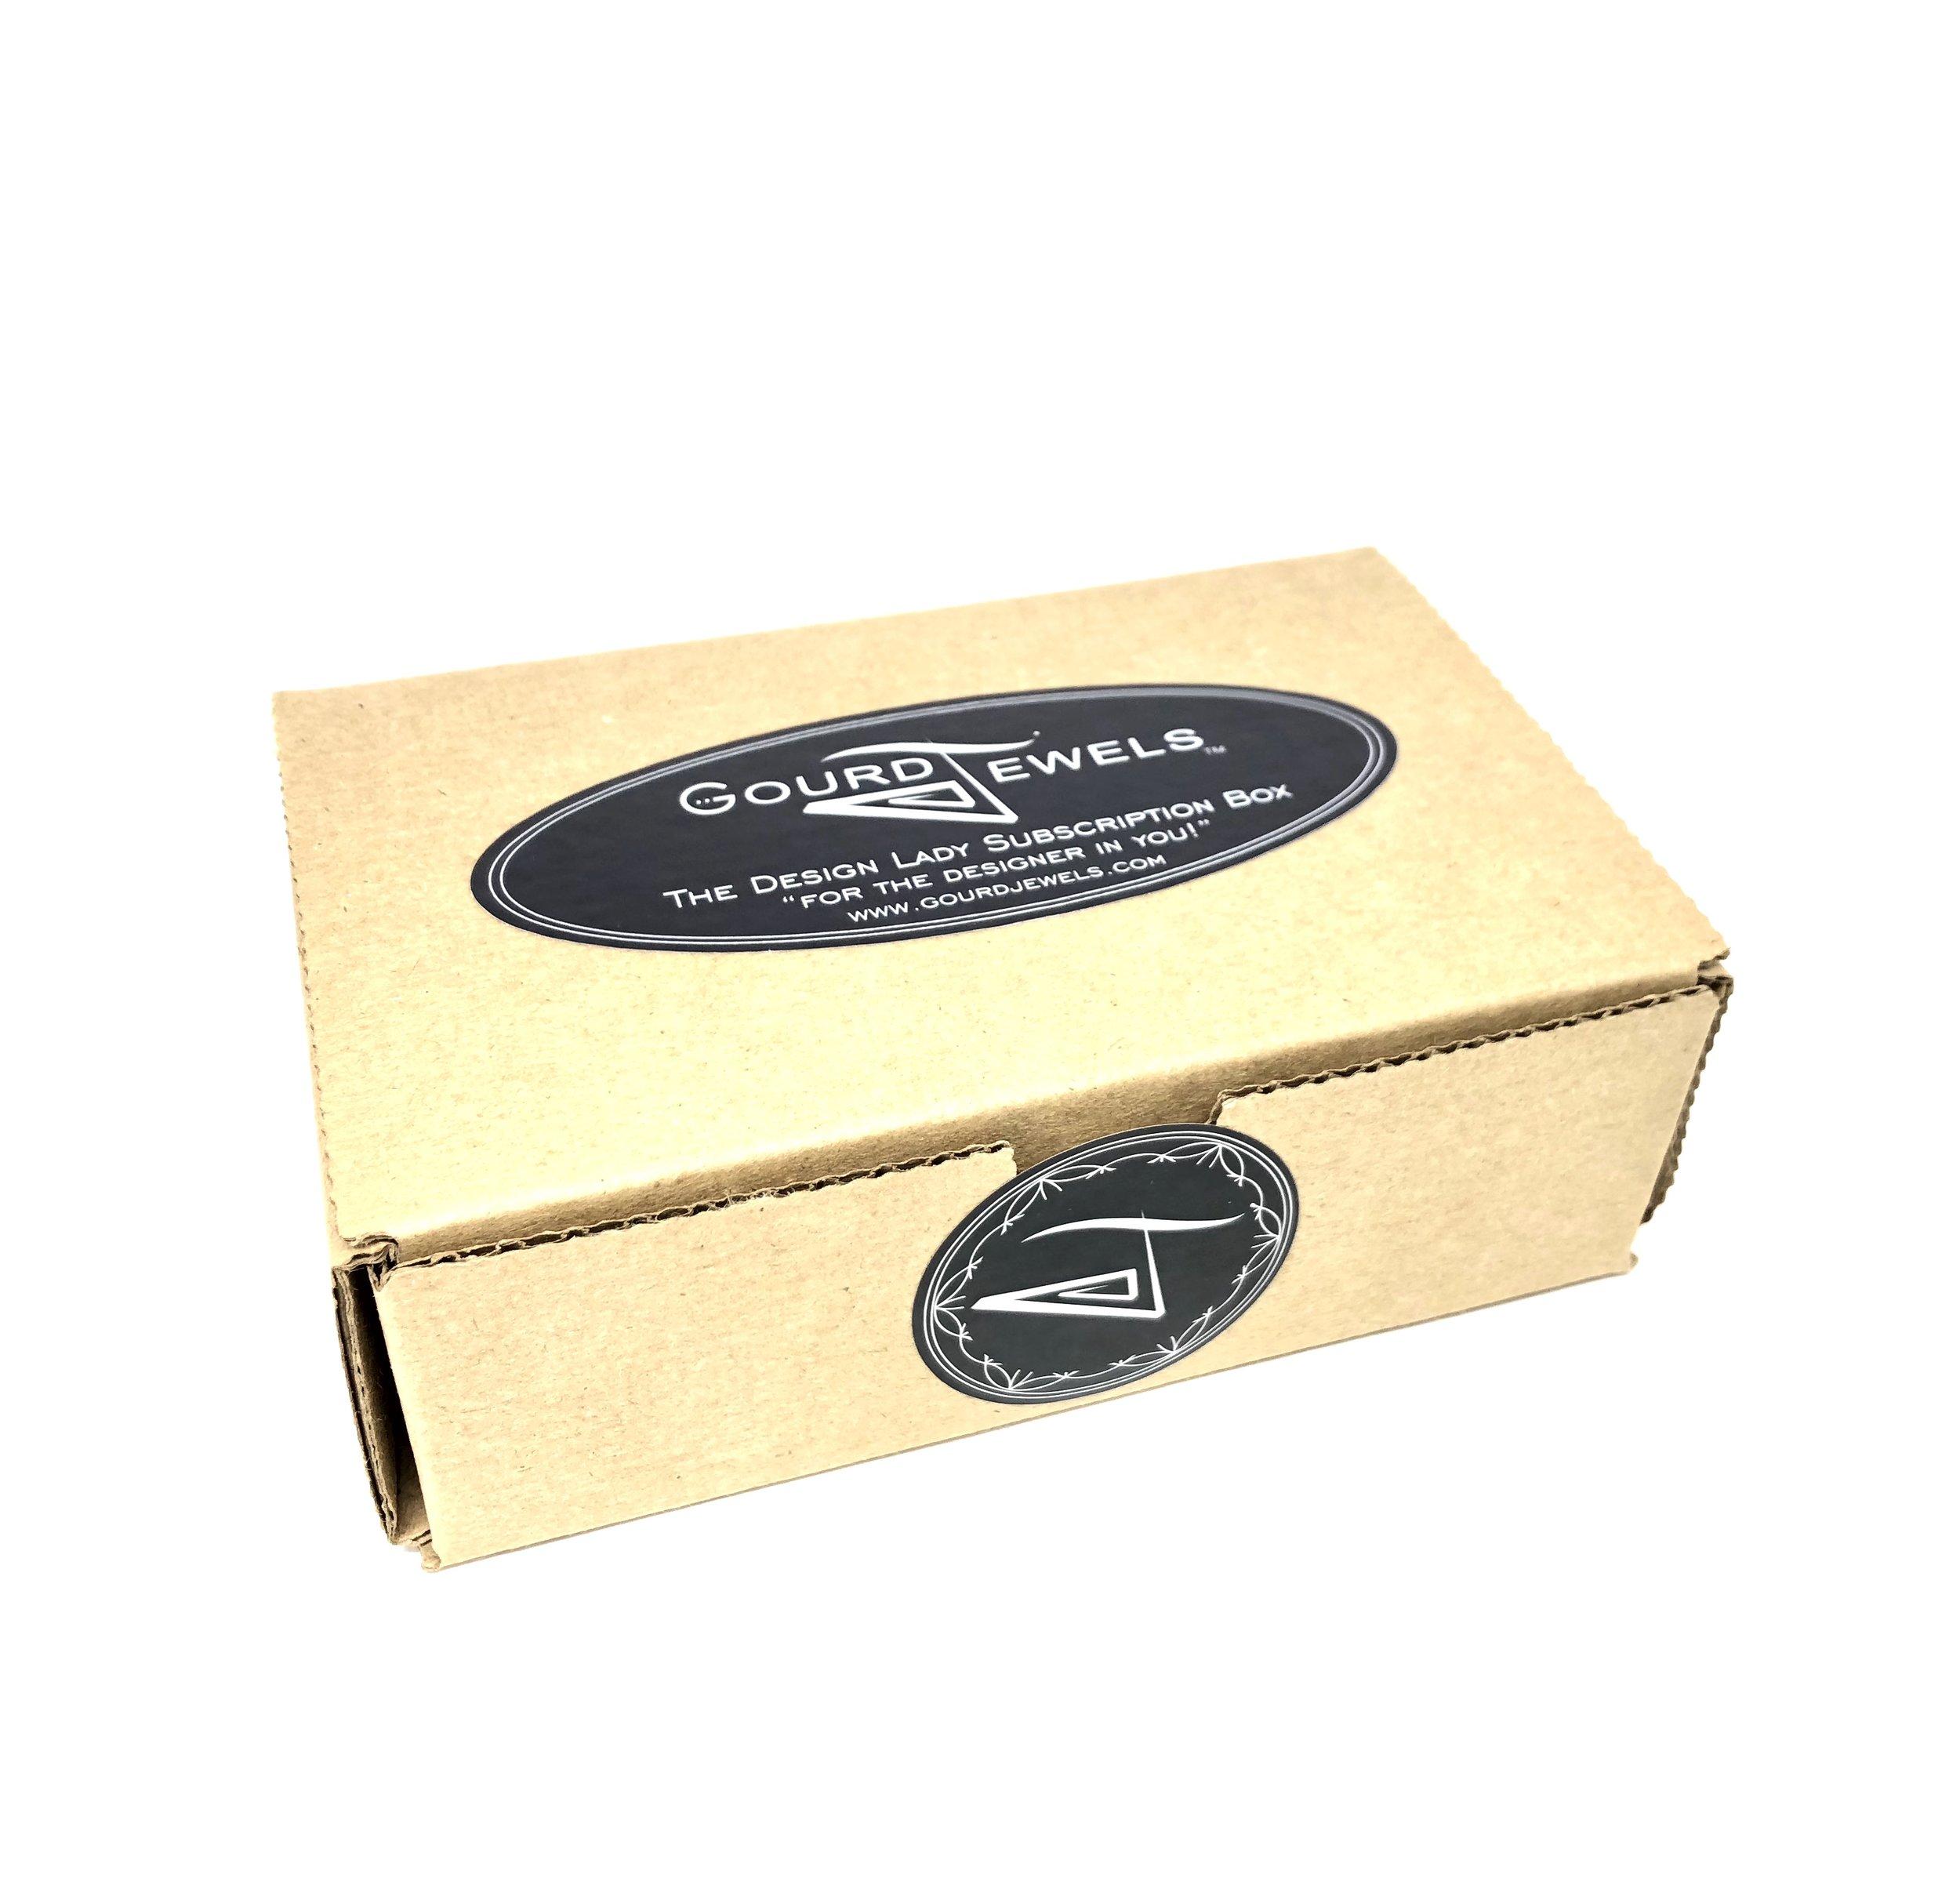 GourdJewels Subscription Box